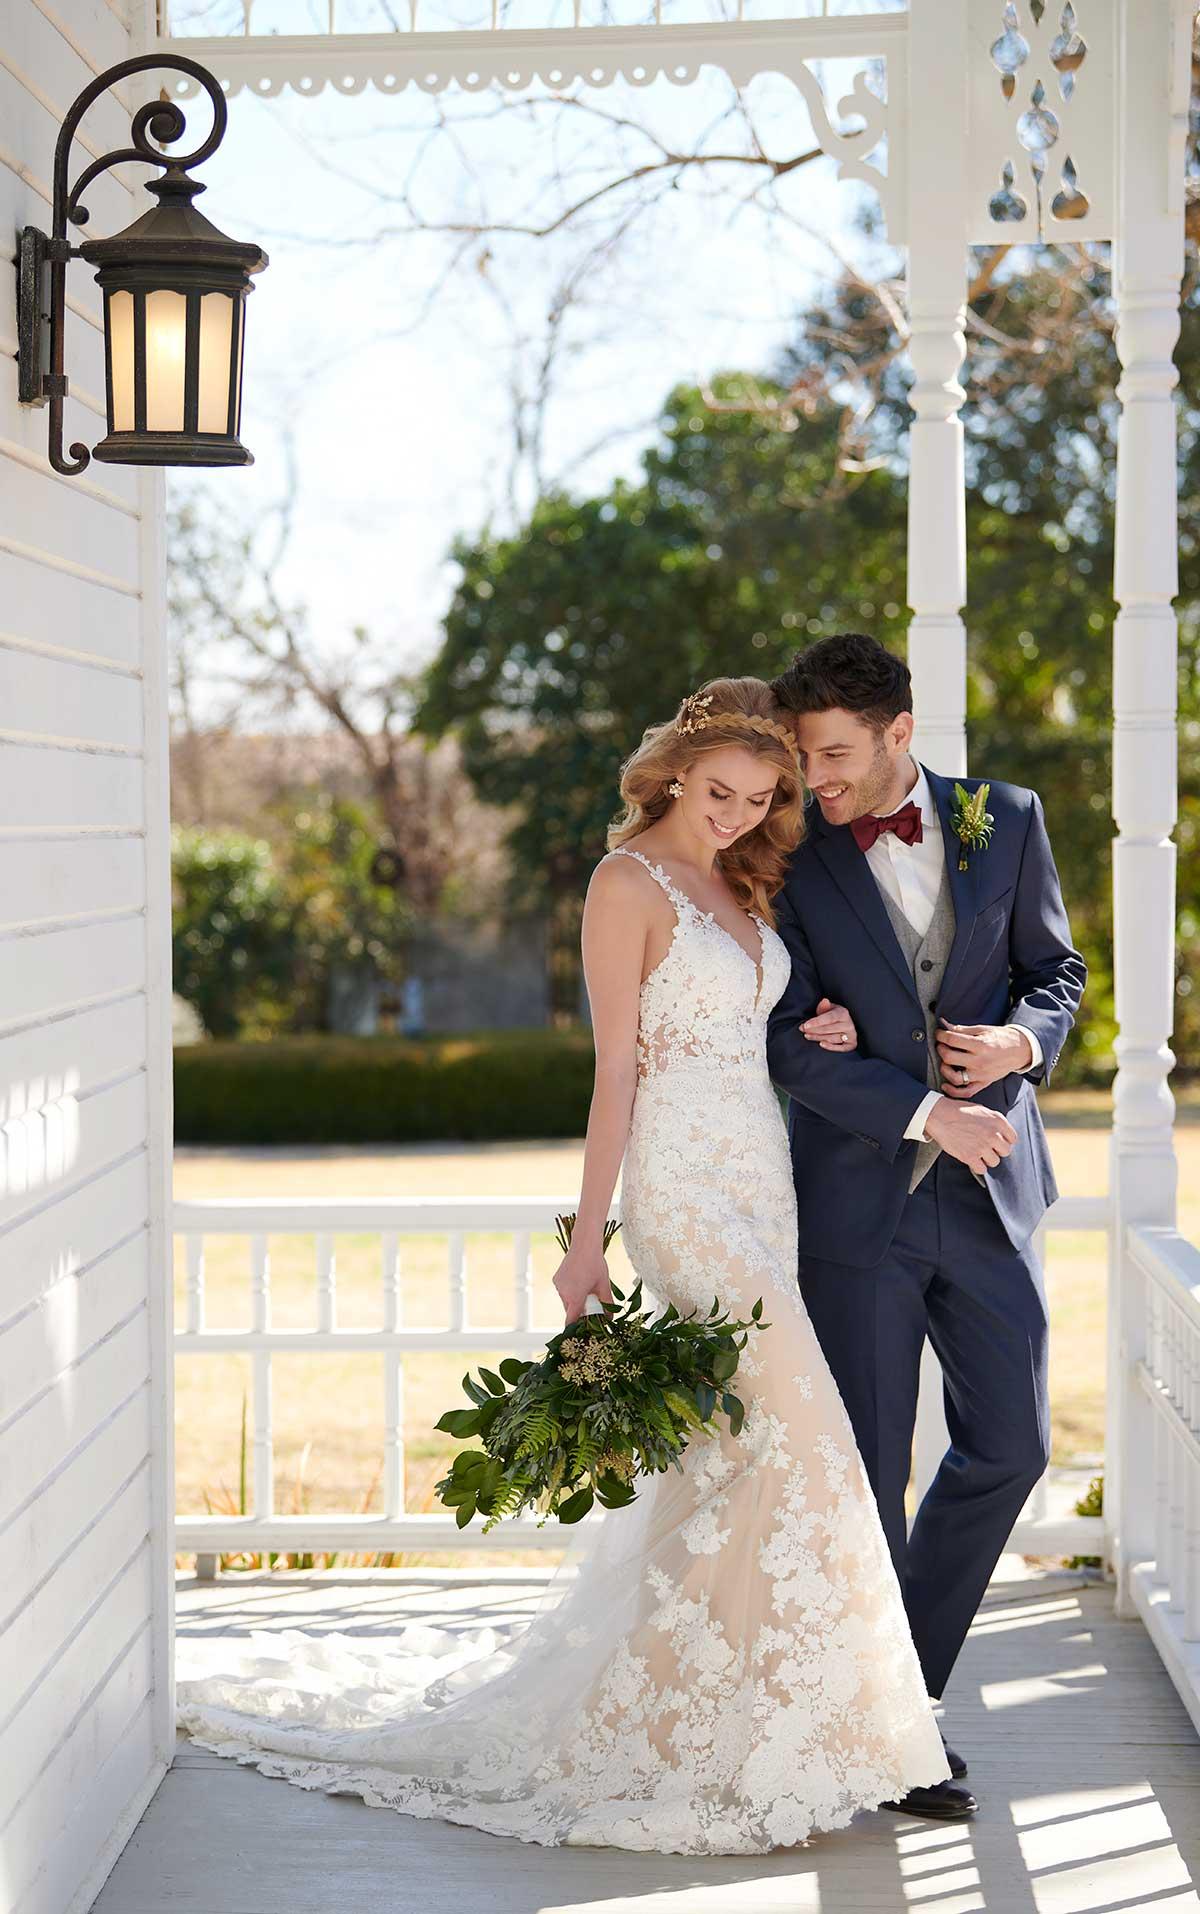 Mira Couture Martina Liana 1030 Wedding Dress Bridal Gown Chicago Boutique Custom Design Full